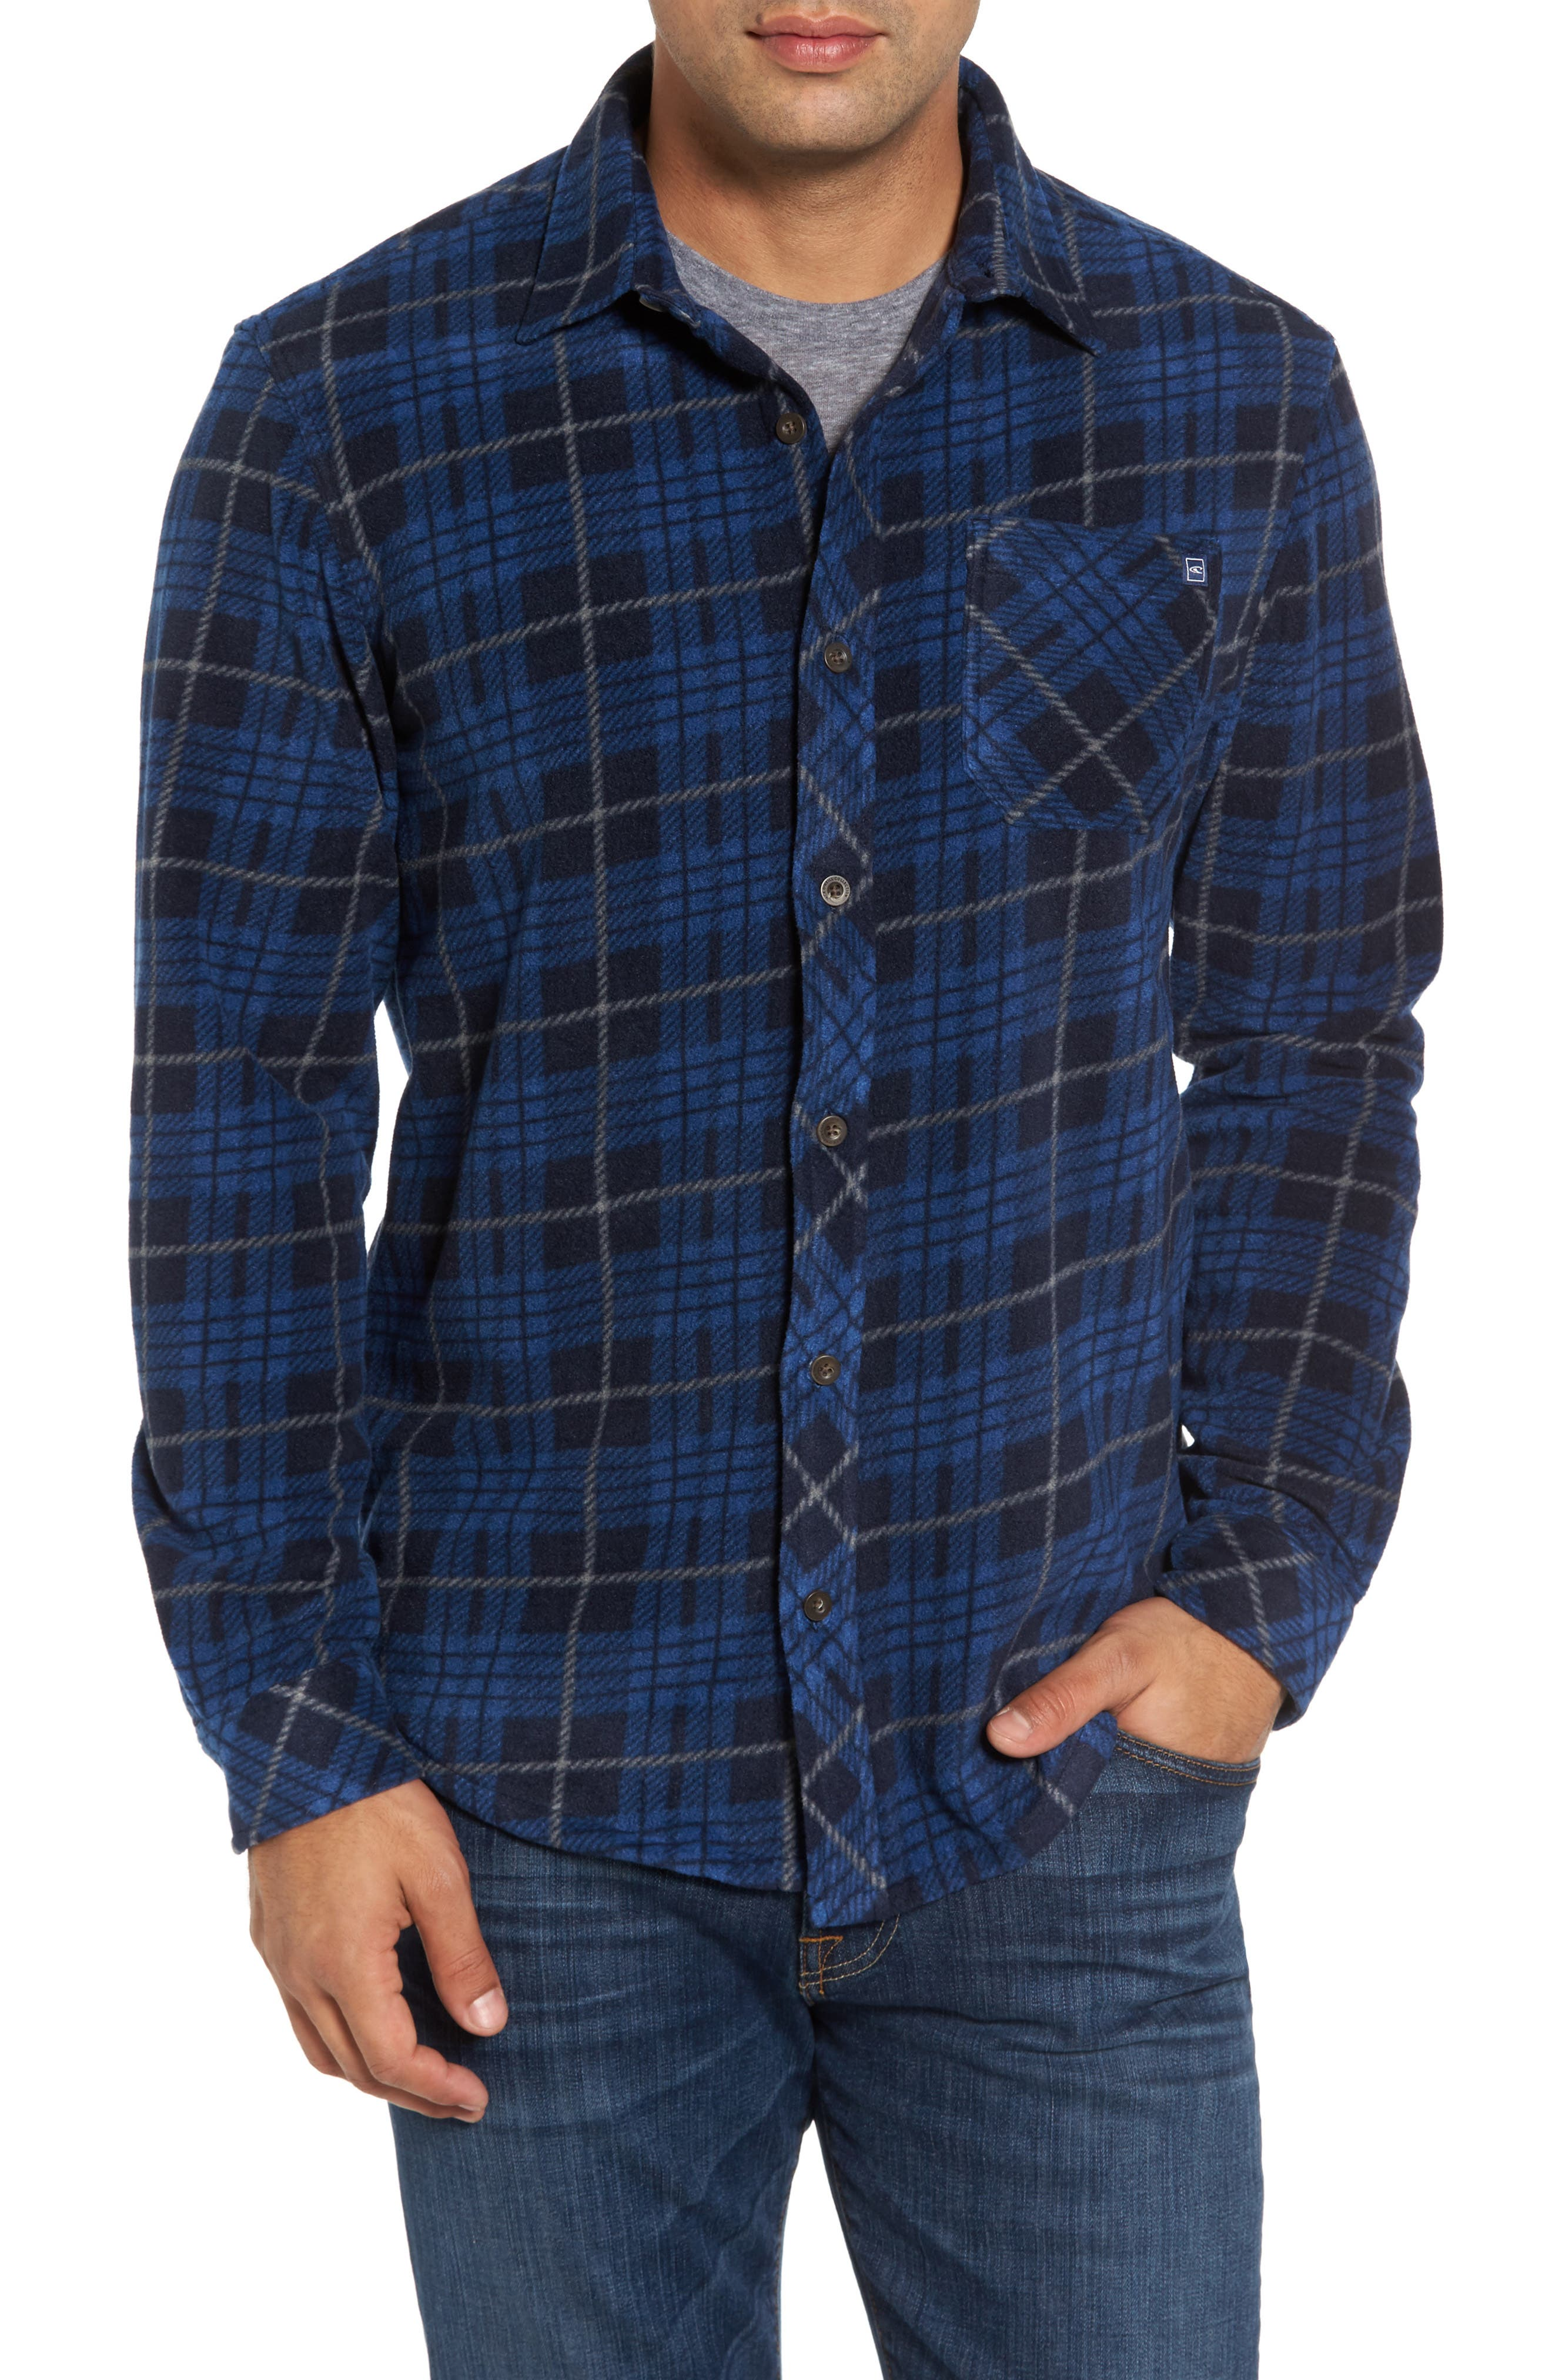 Breakers Regular Fit Plaid Fleece Shirt,                         Main,                         color, Navy